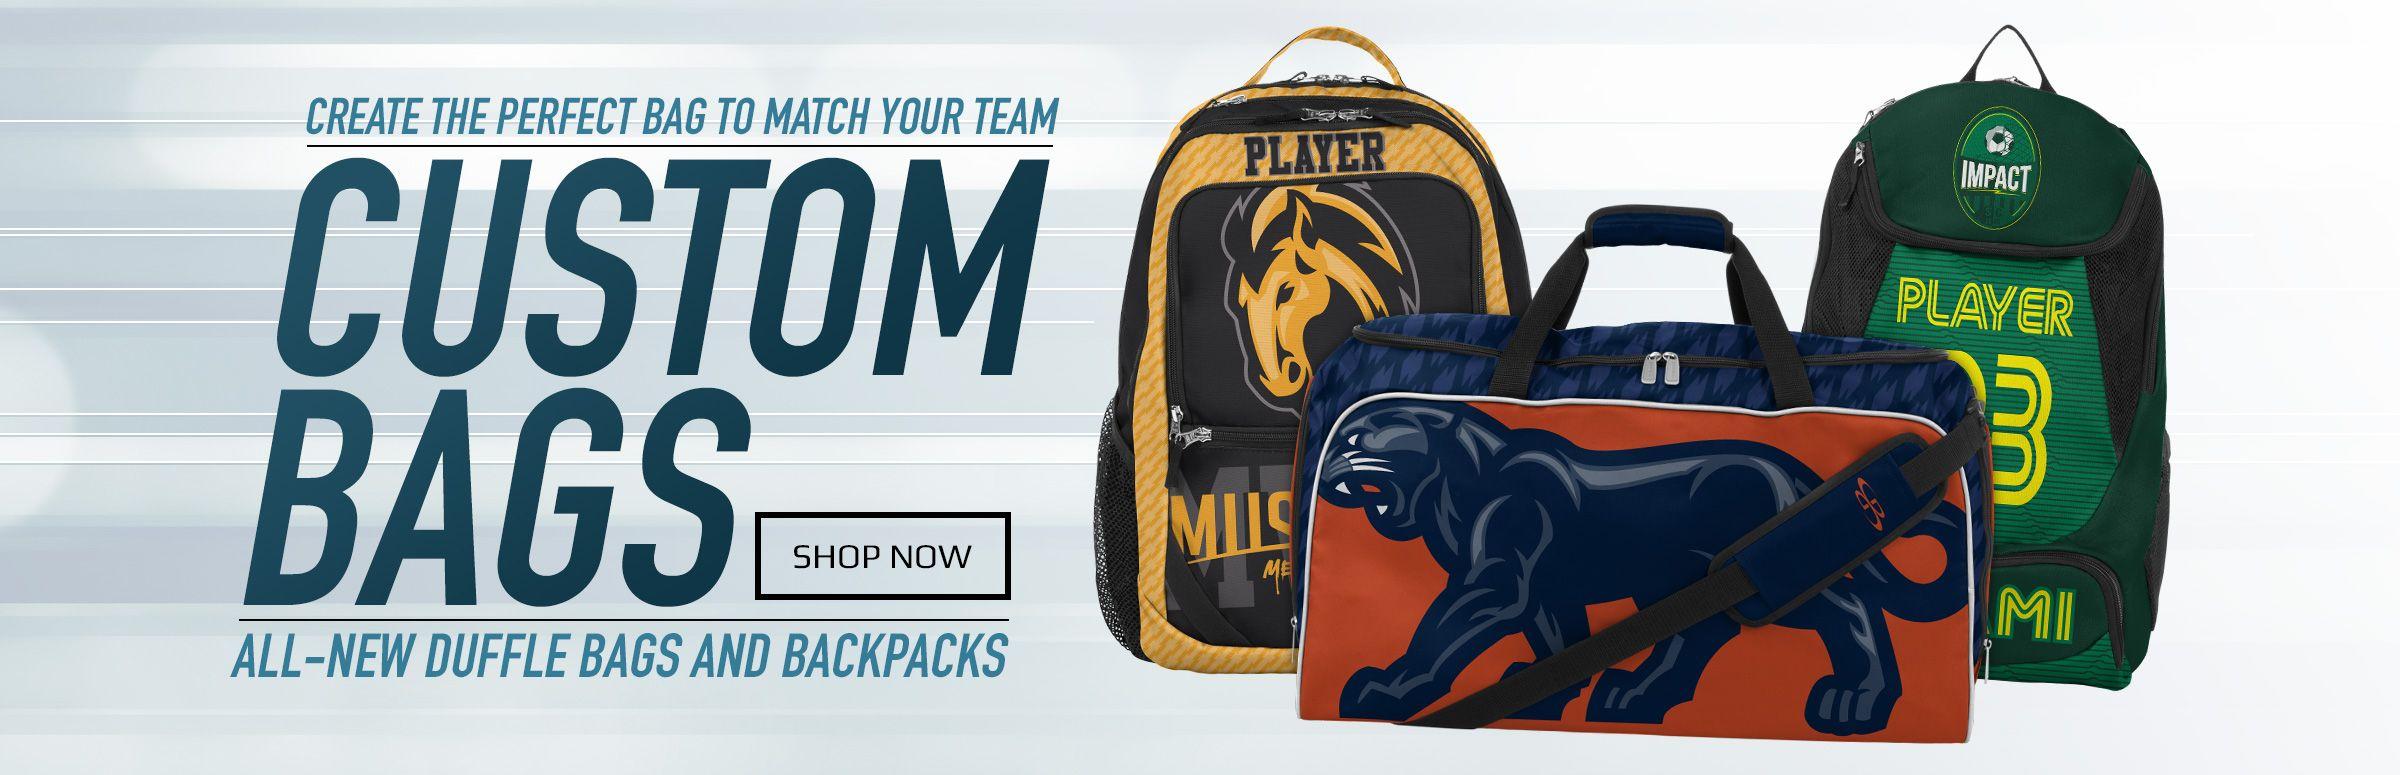 All-New Custom Bags